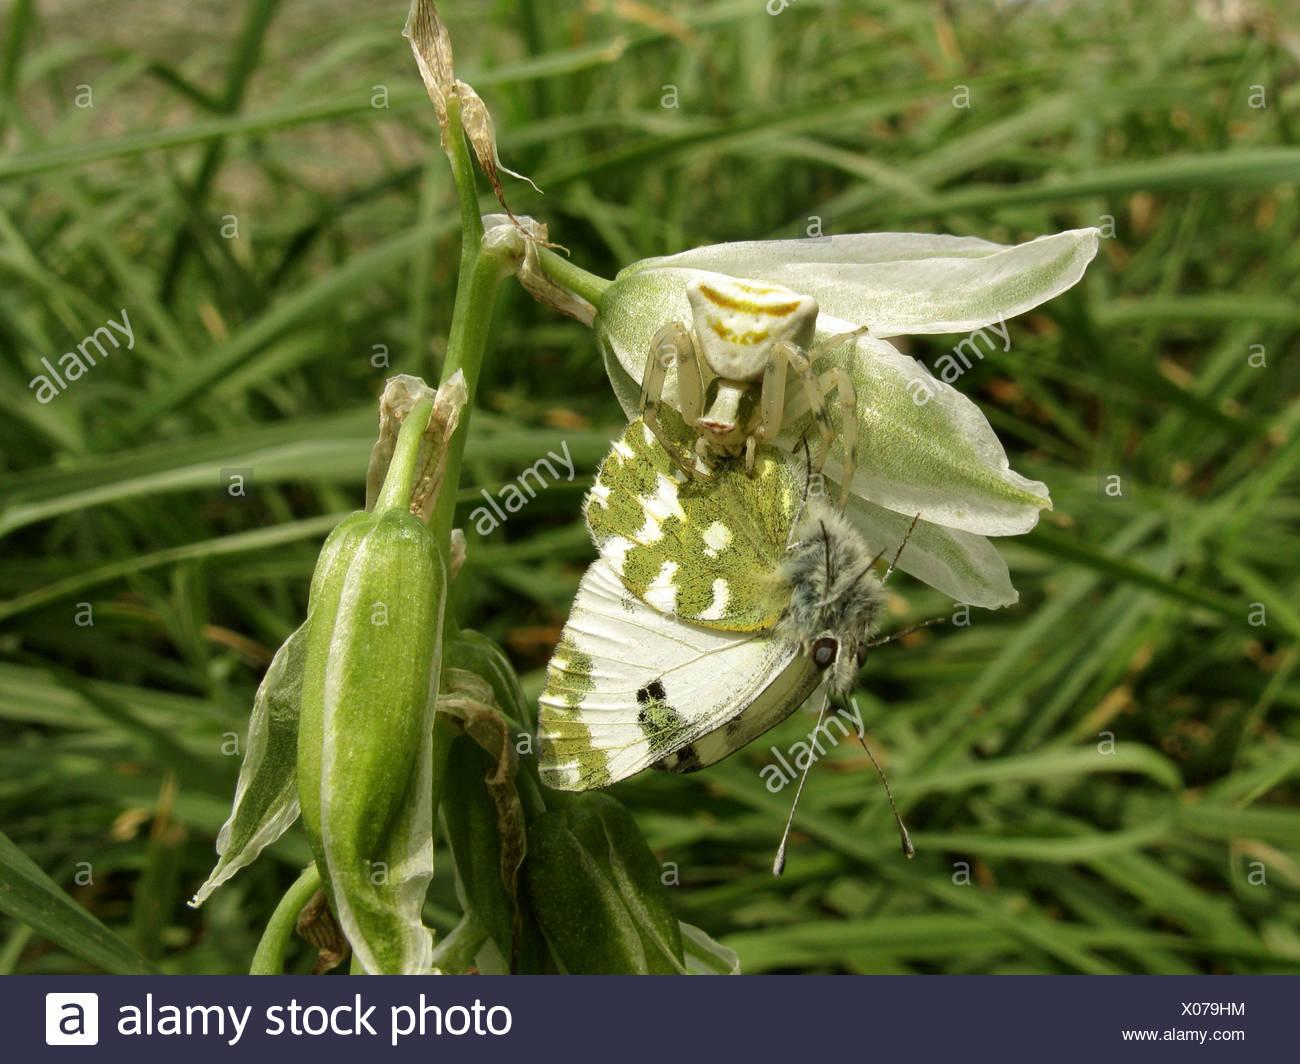 bath white (Pontia daplidice), drooping star-of-bethlehem, Ornithogalum nutans, Greece, Peloponnese Stock Photo